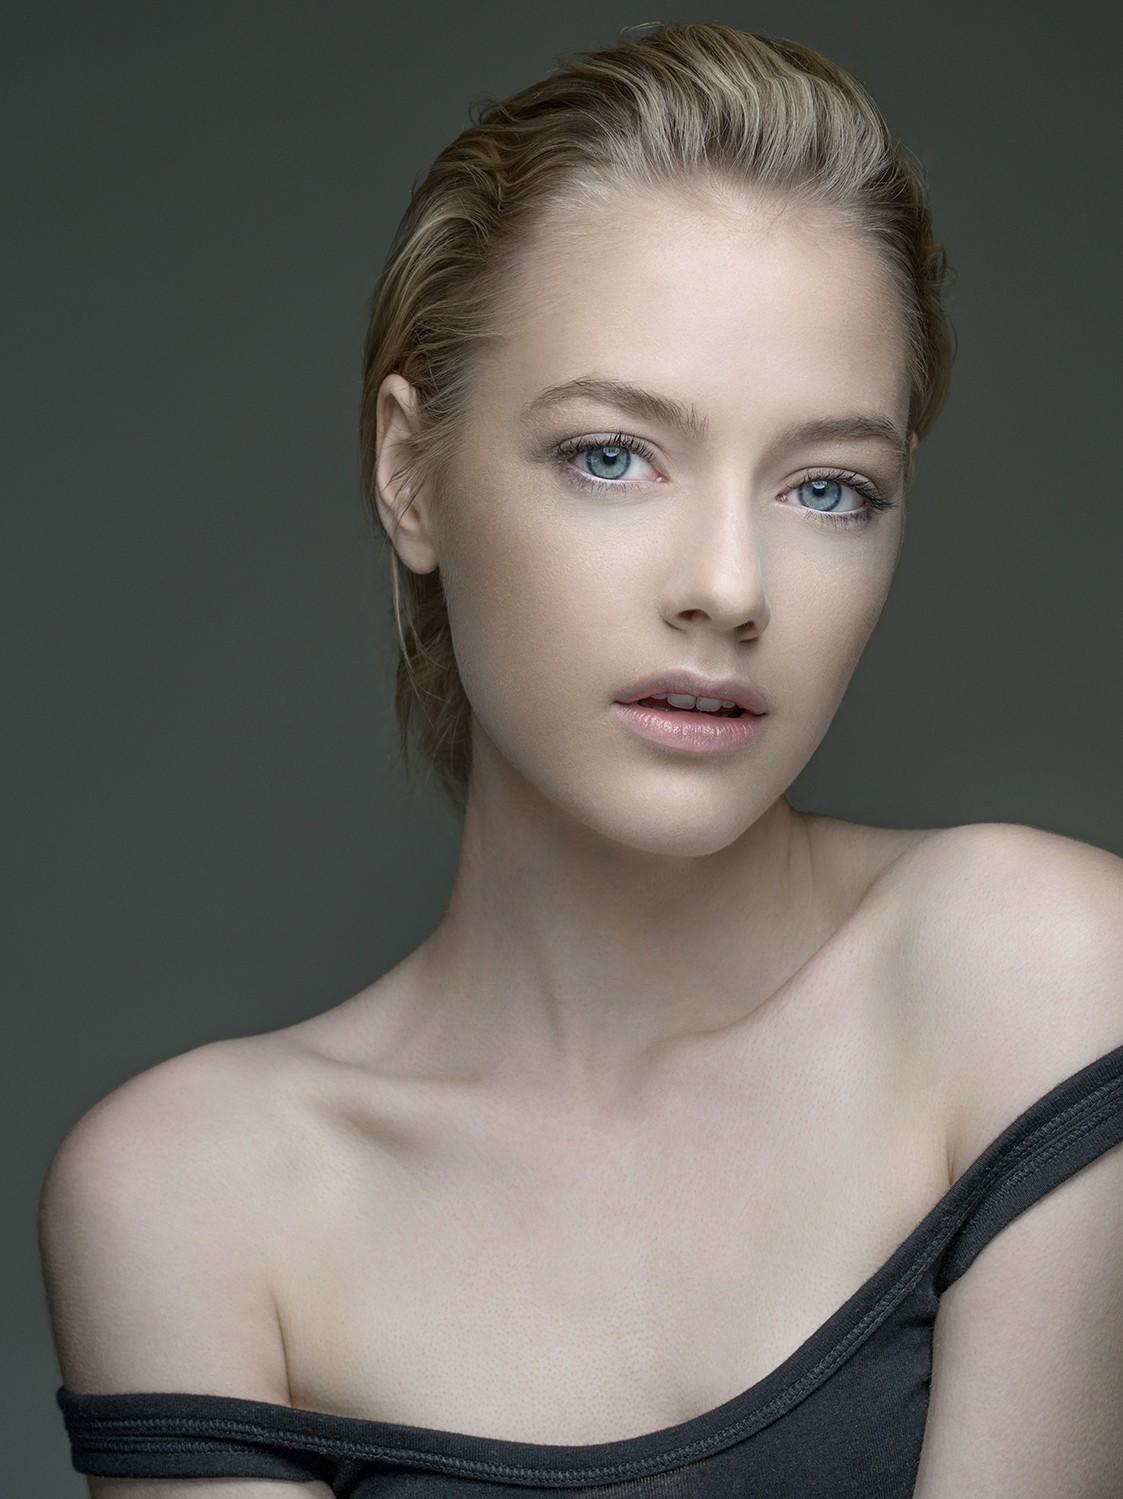 Cosmetics And Makeup: Beauty Headshot